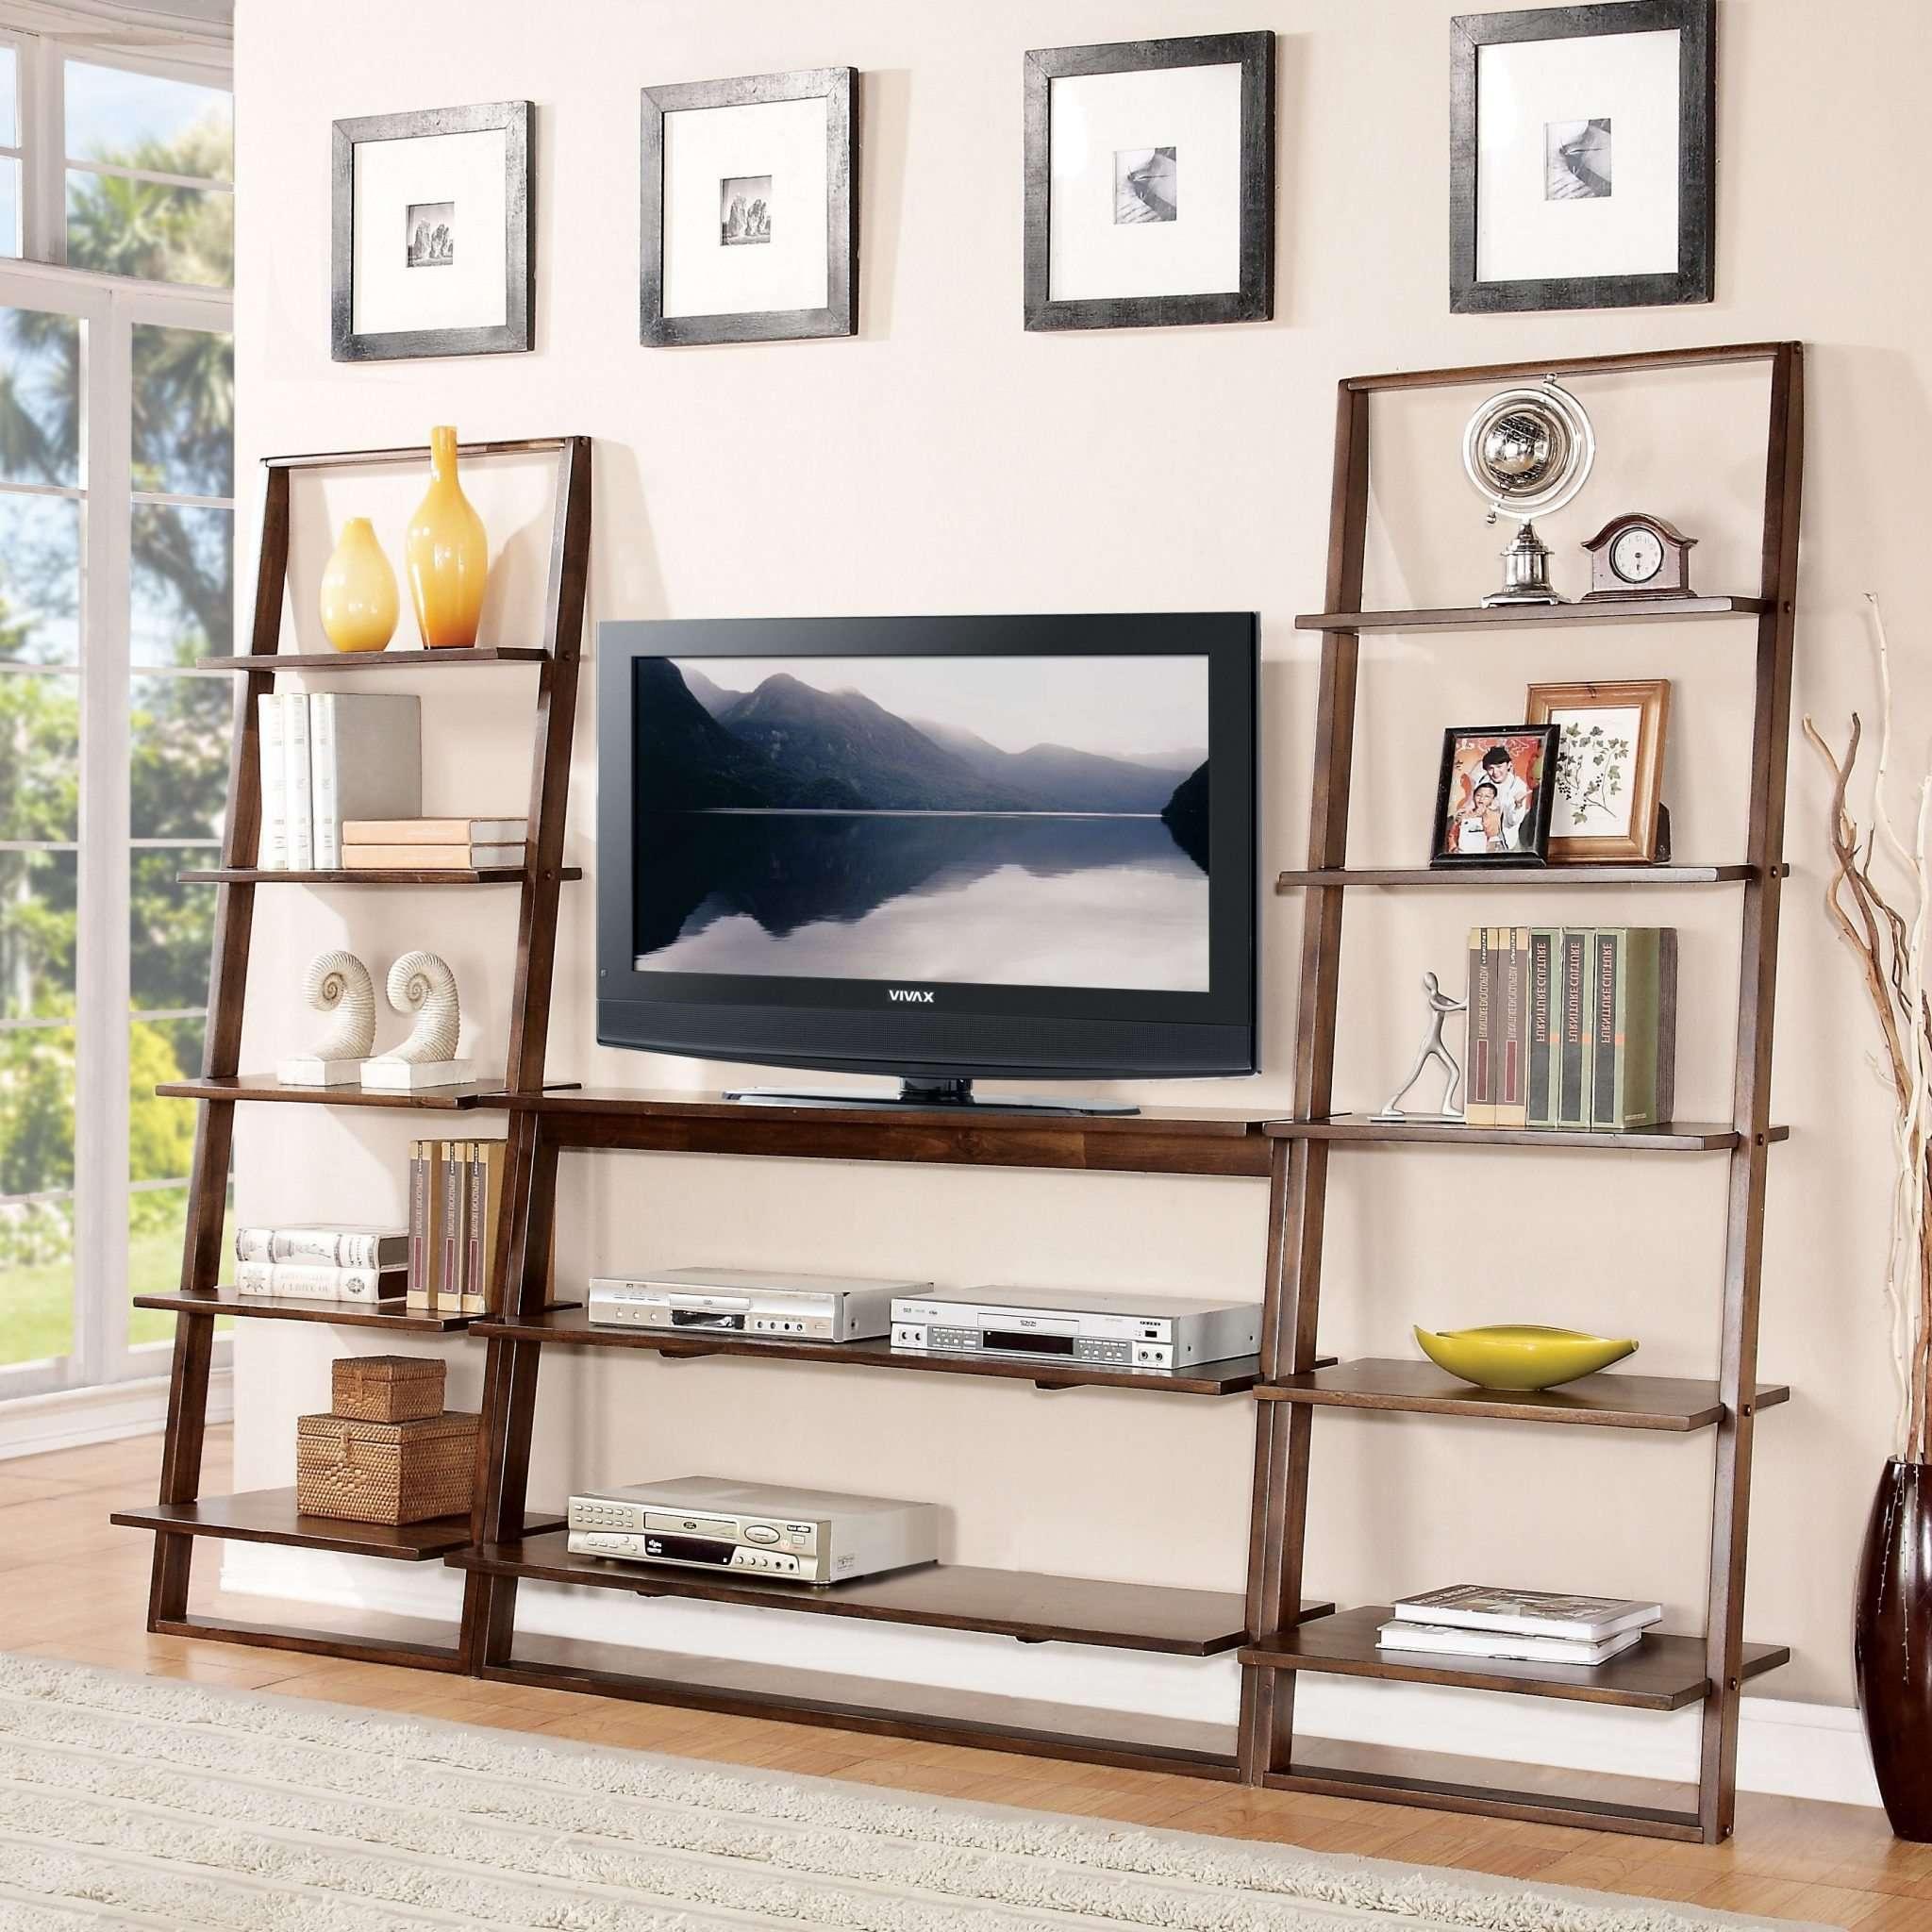 Bookshelf Tv Stand Regarding Tv Stands And Bookshelf (View 2 of 15)